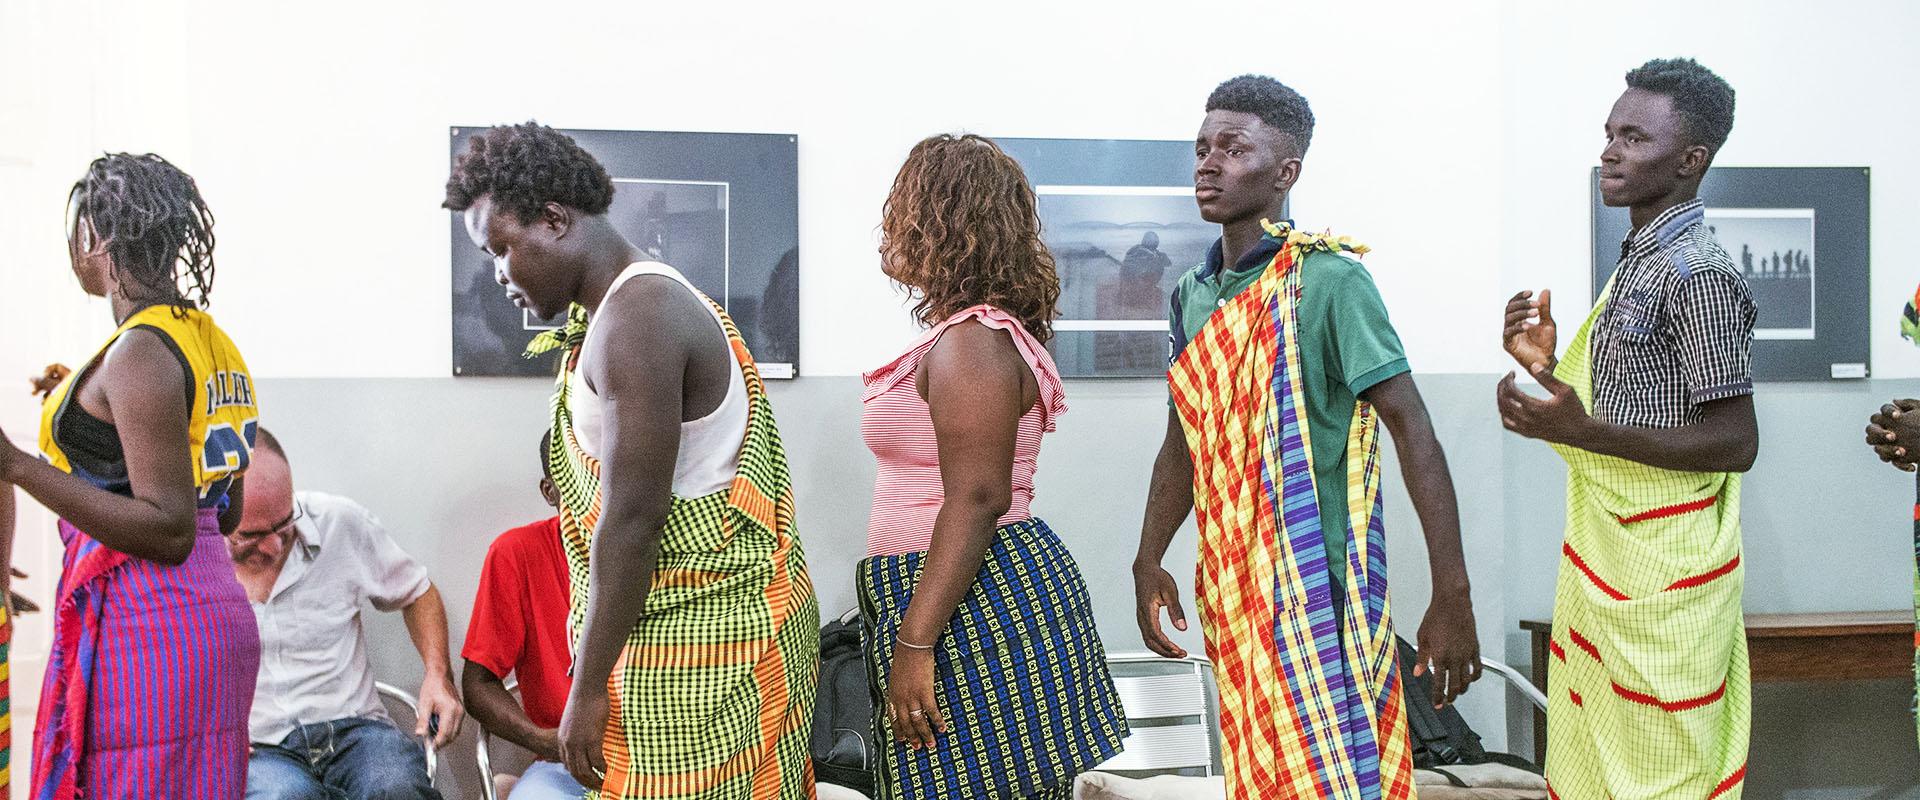 festeggiamenti cerimonia progetto carceri Guinea Bissau Mani Tese 2017